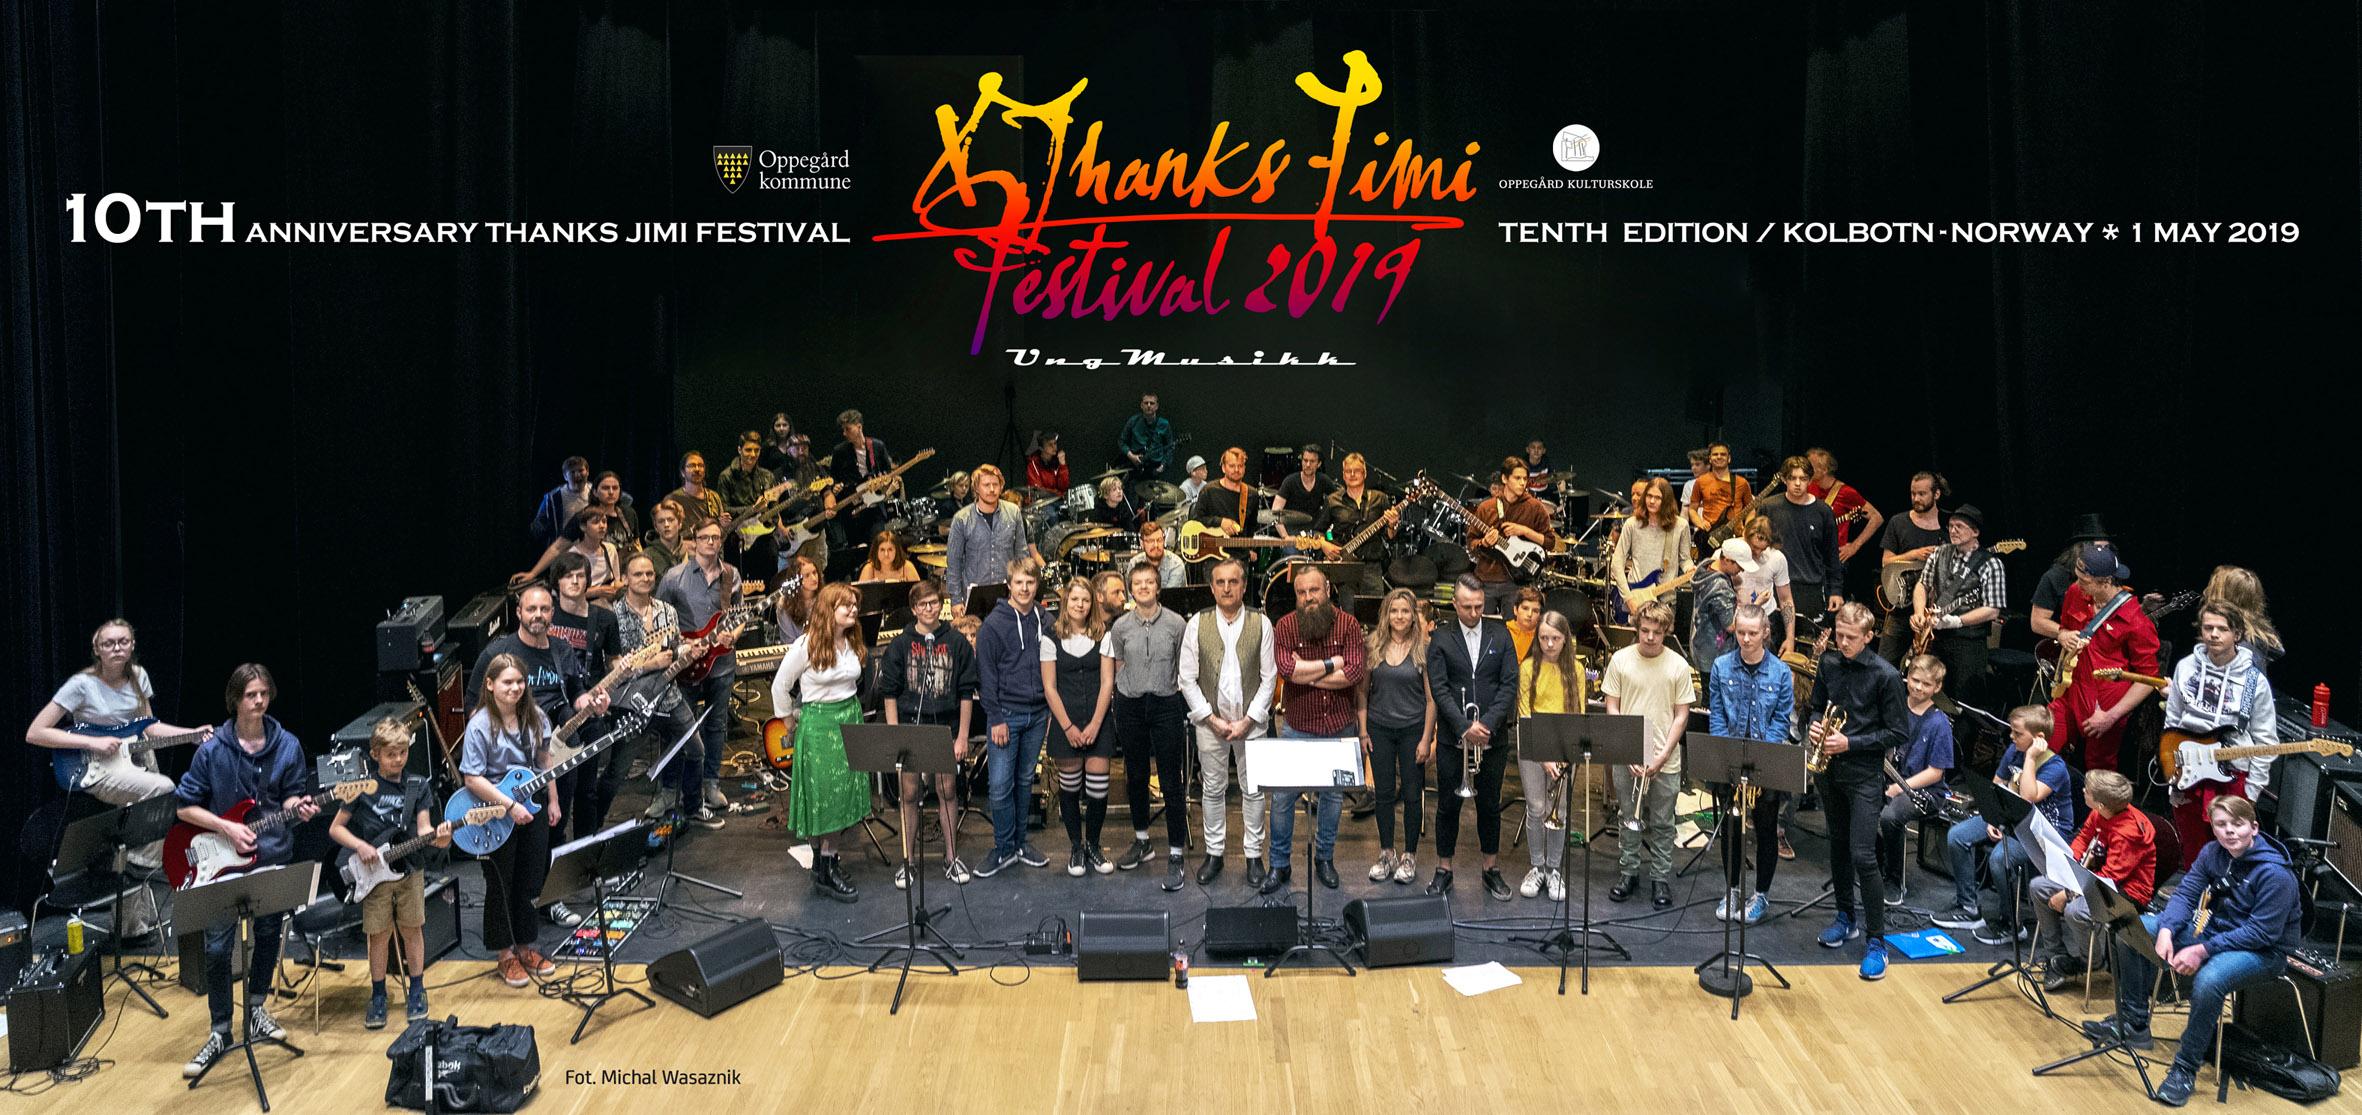 Thanks Jimi Festival 2019